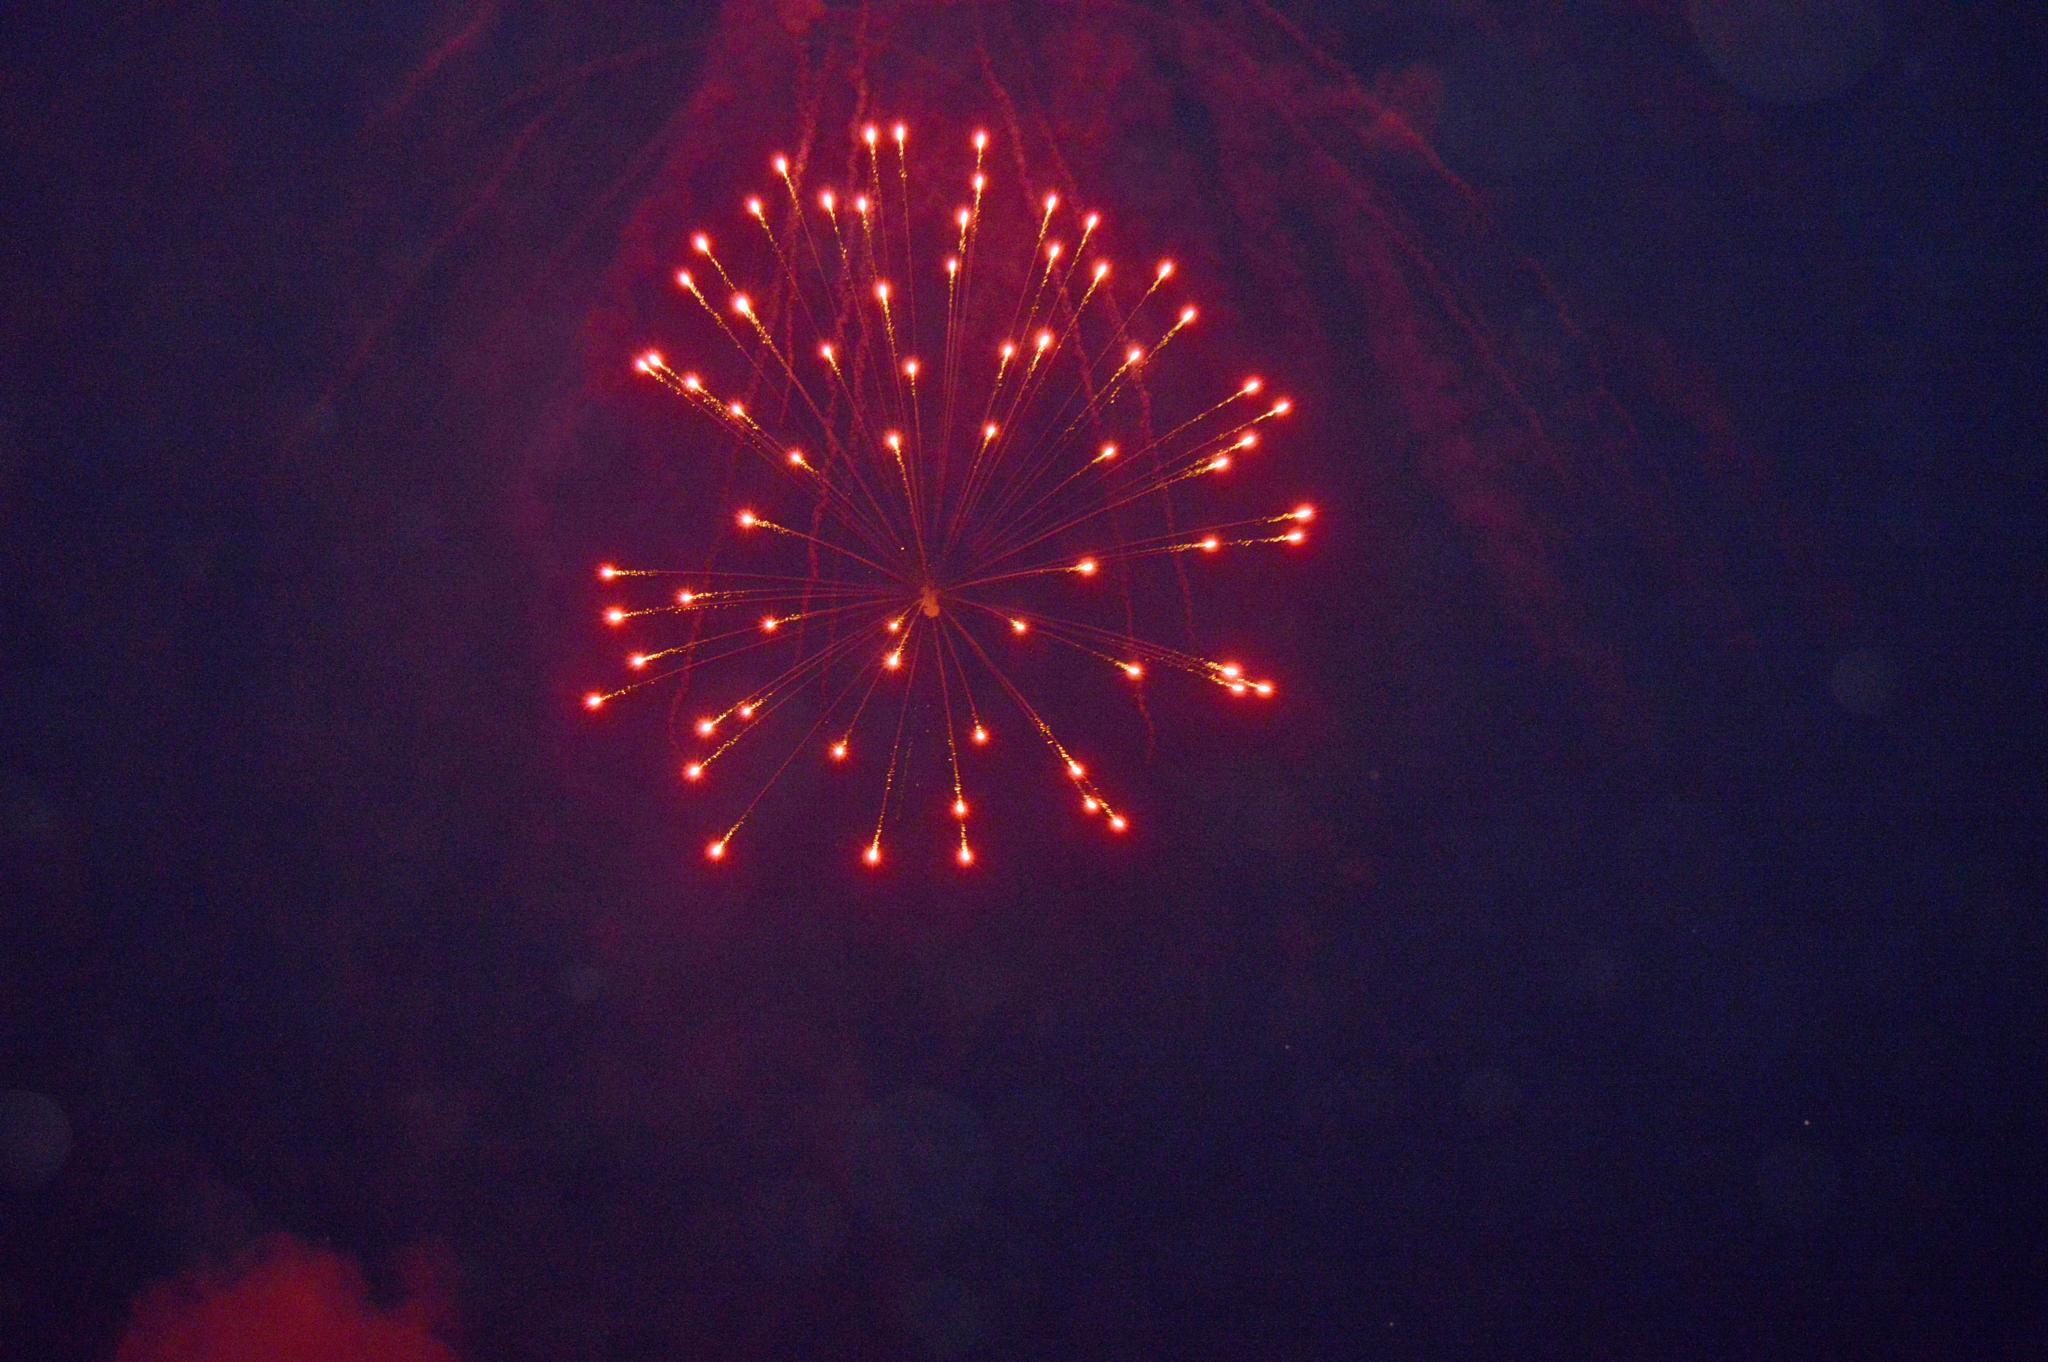 firework burst 3 by michael.alexandersr